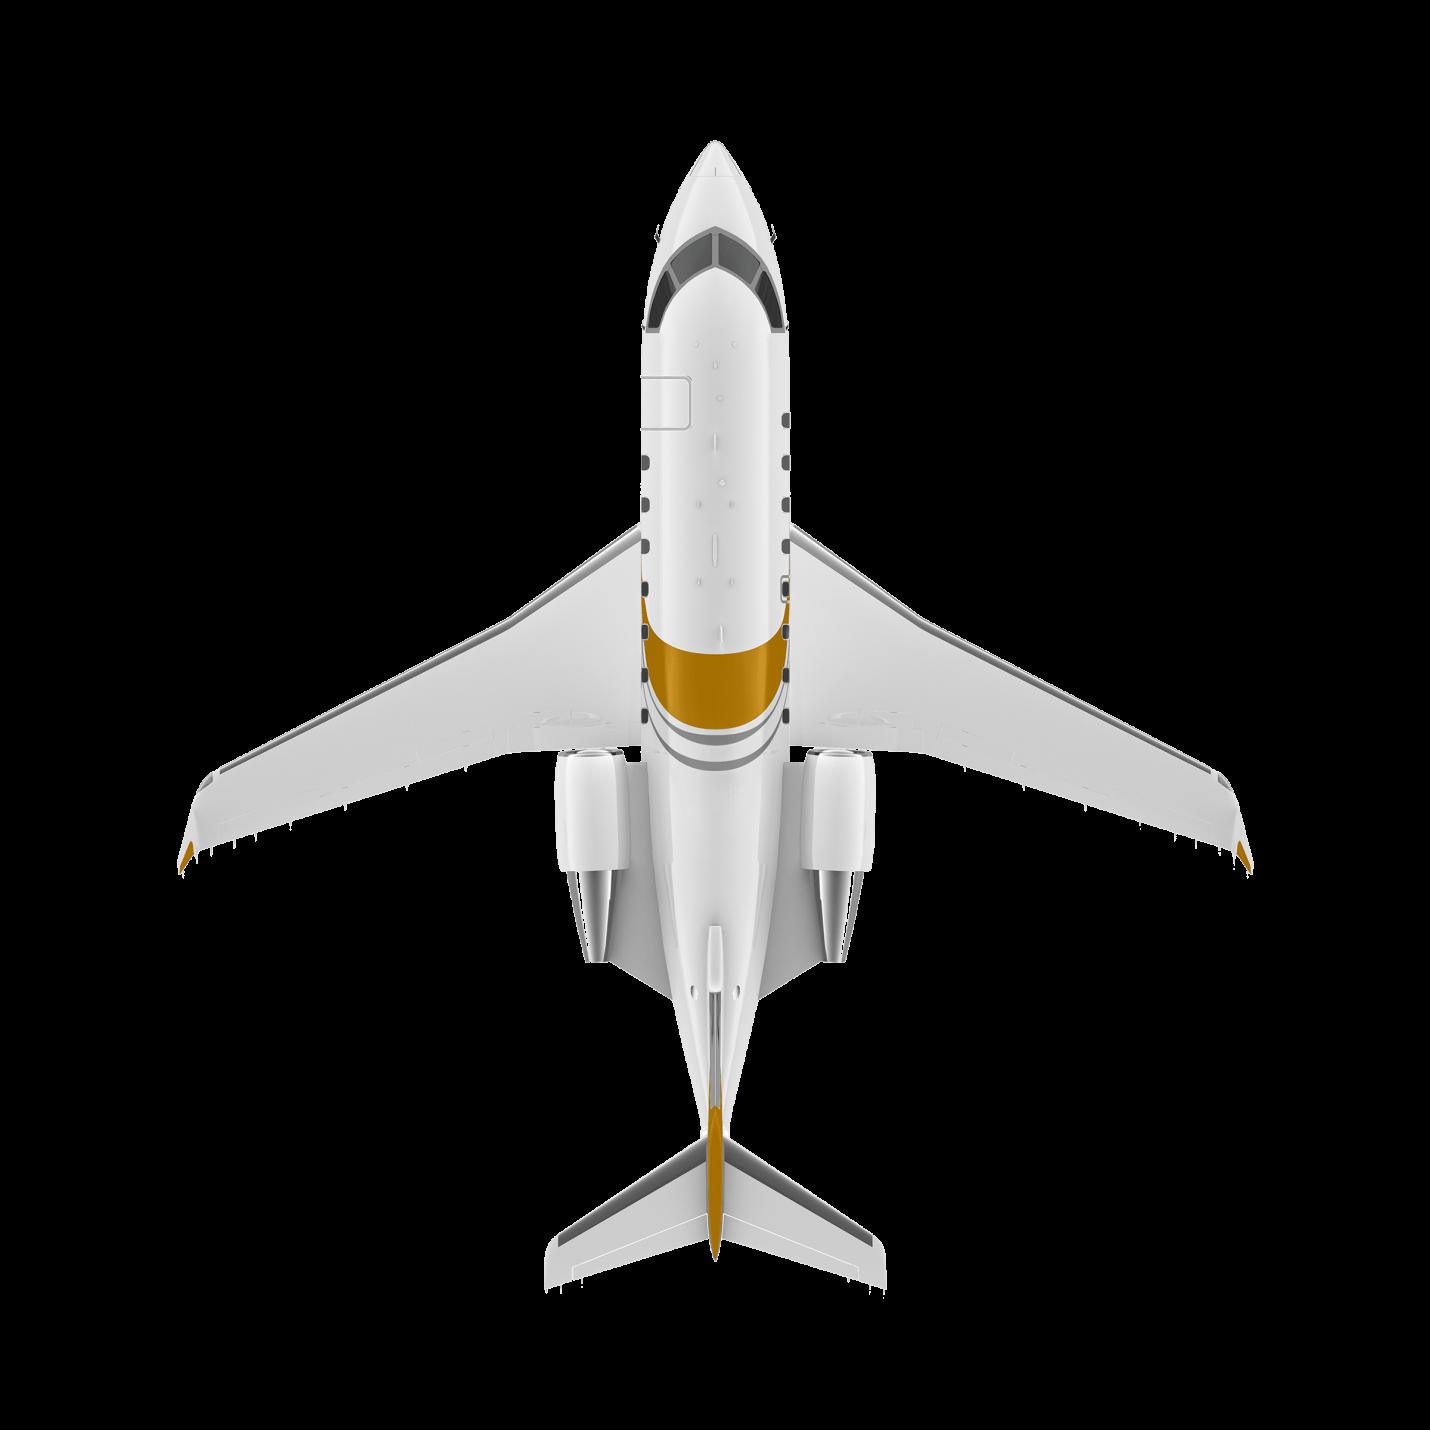 Challenger 650 top view